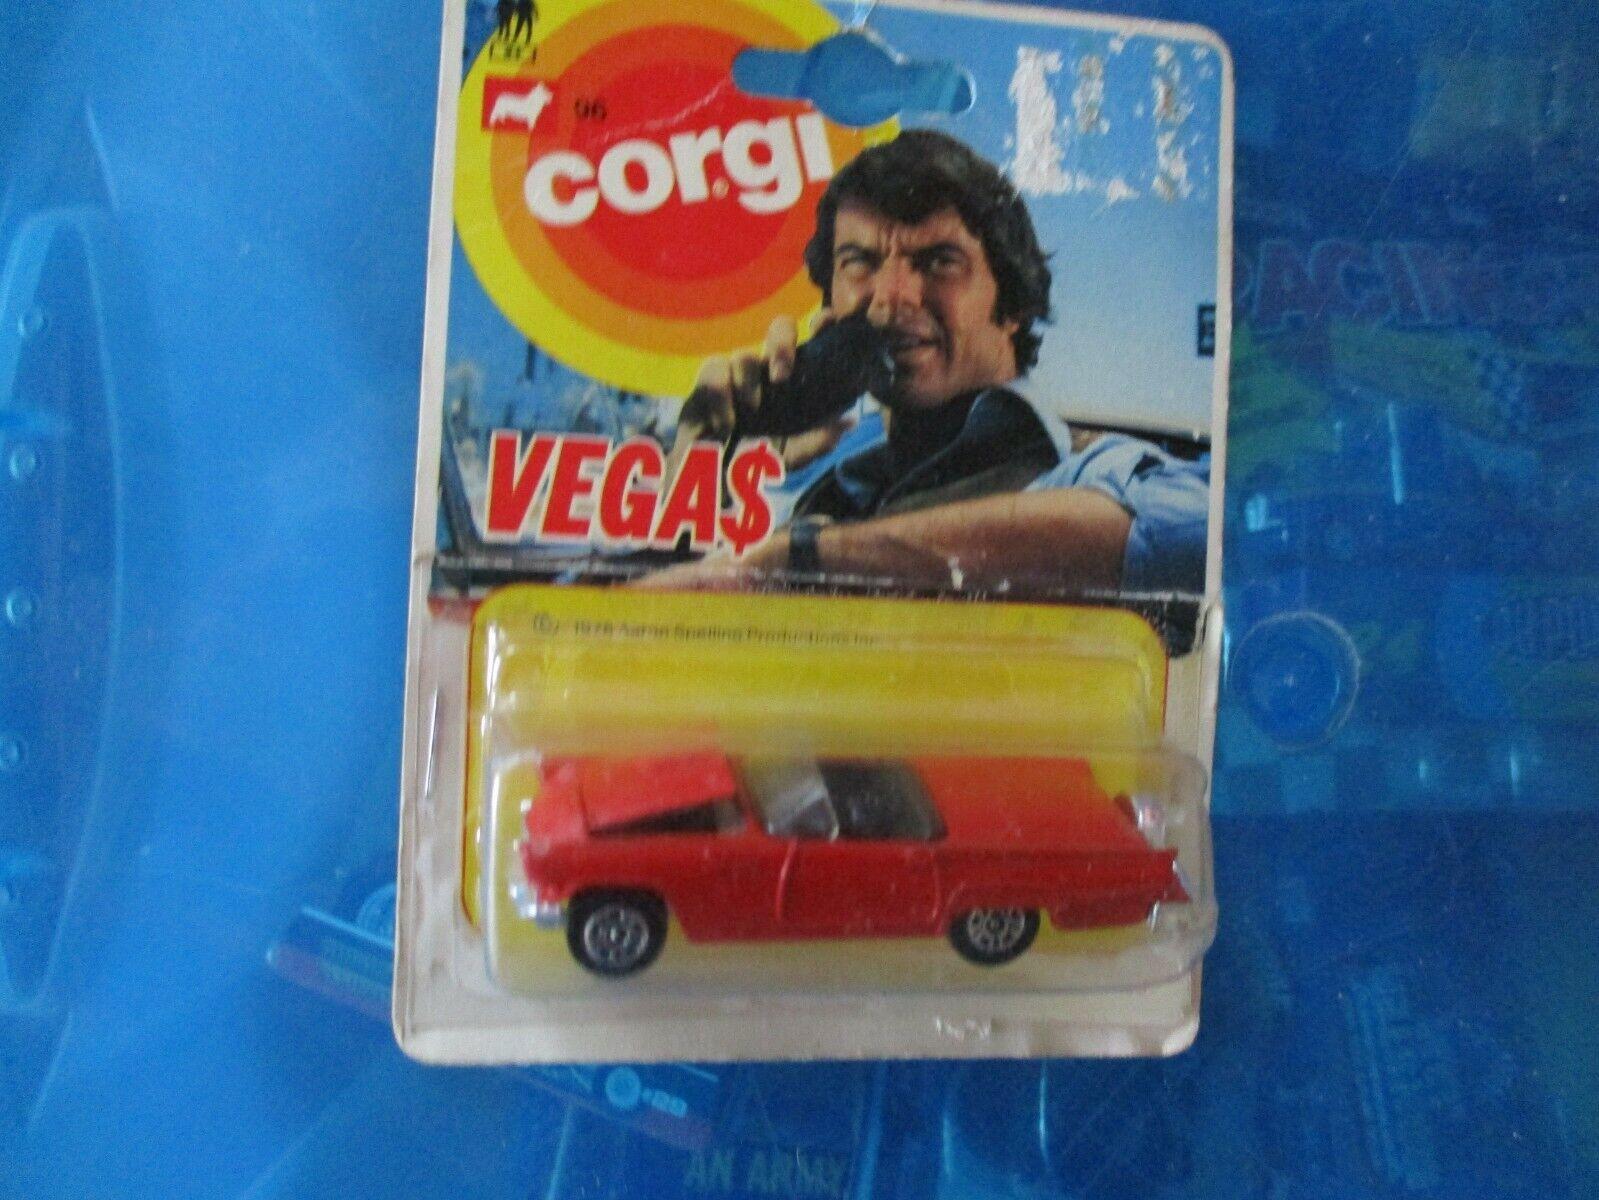 RARE- Corgi Vegas Movie Car 1 64th scale die cast - Made in Great Britain (1978)